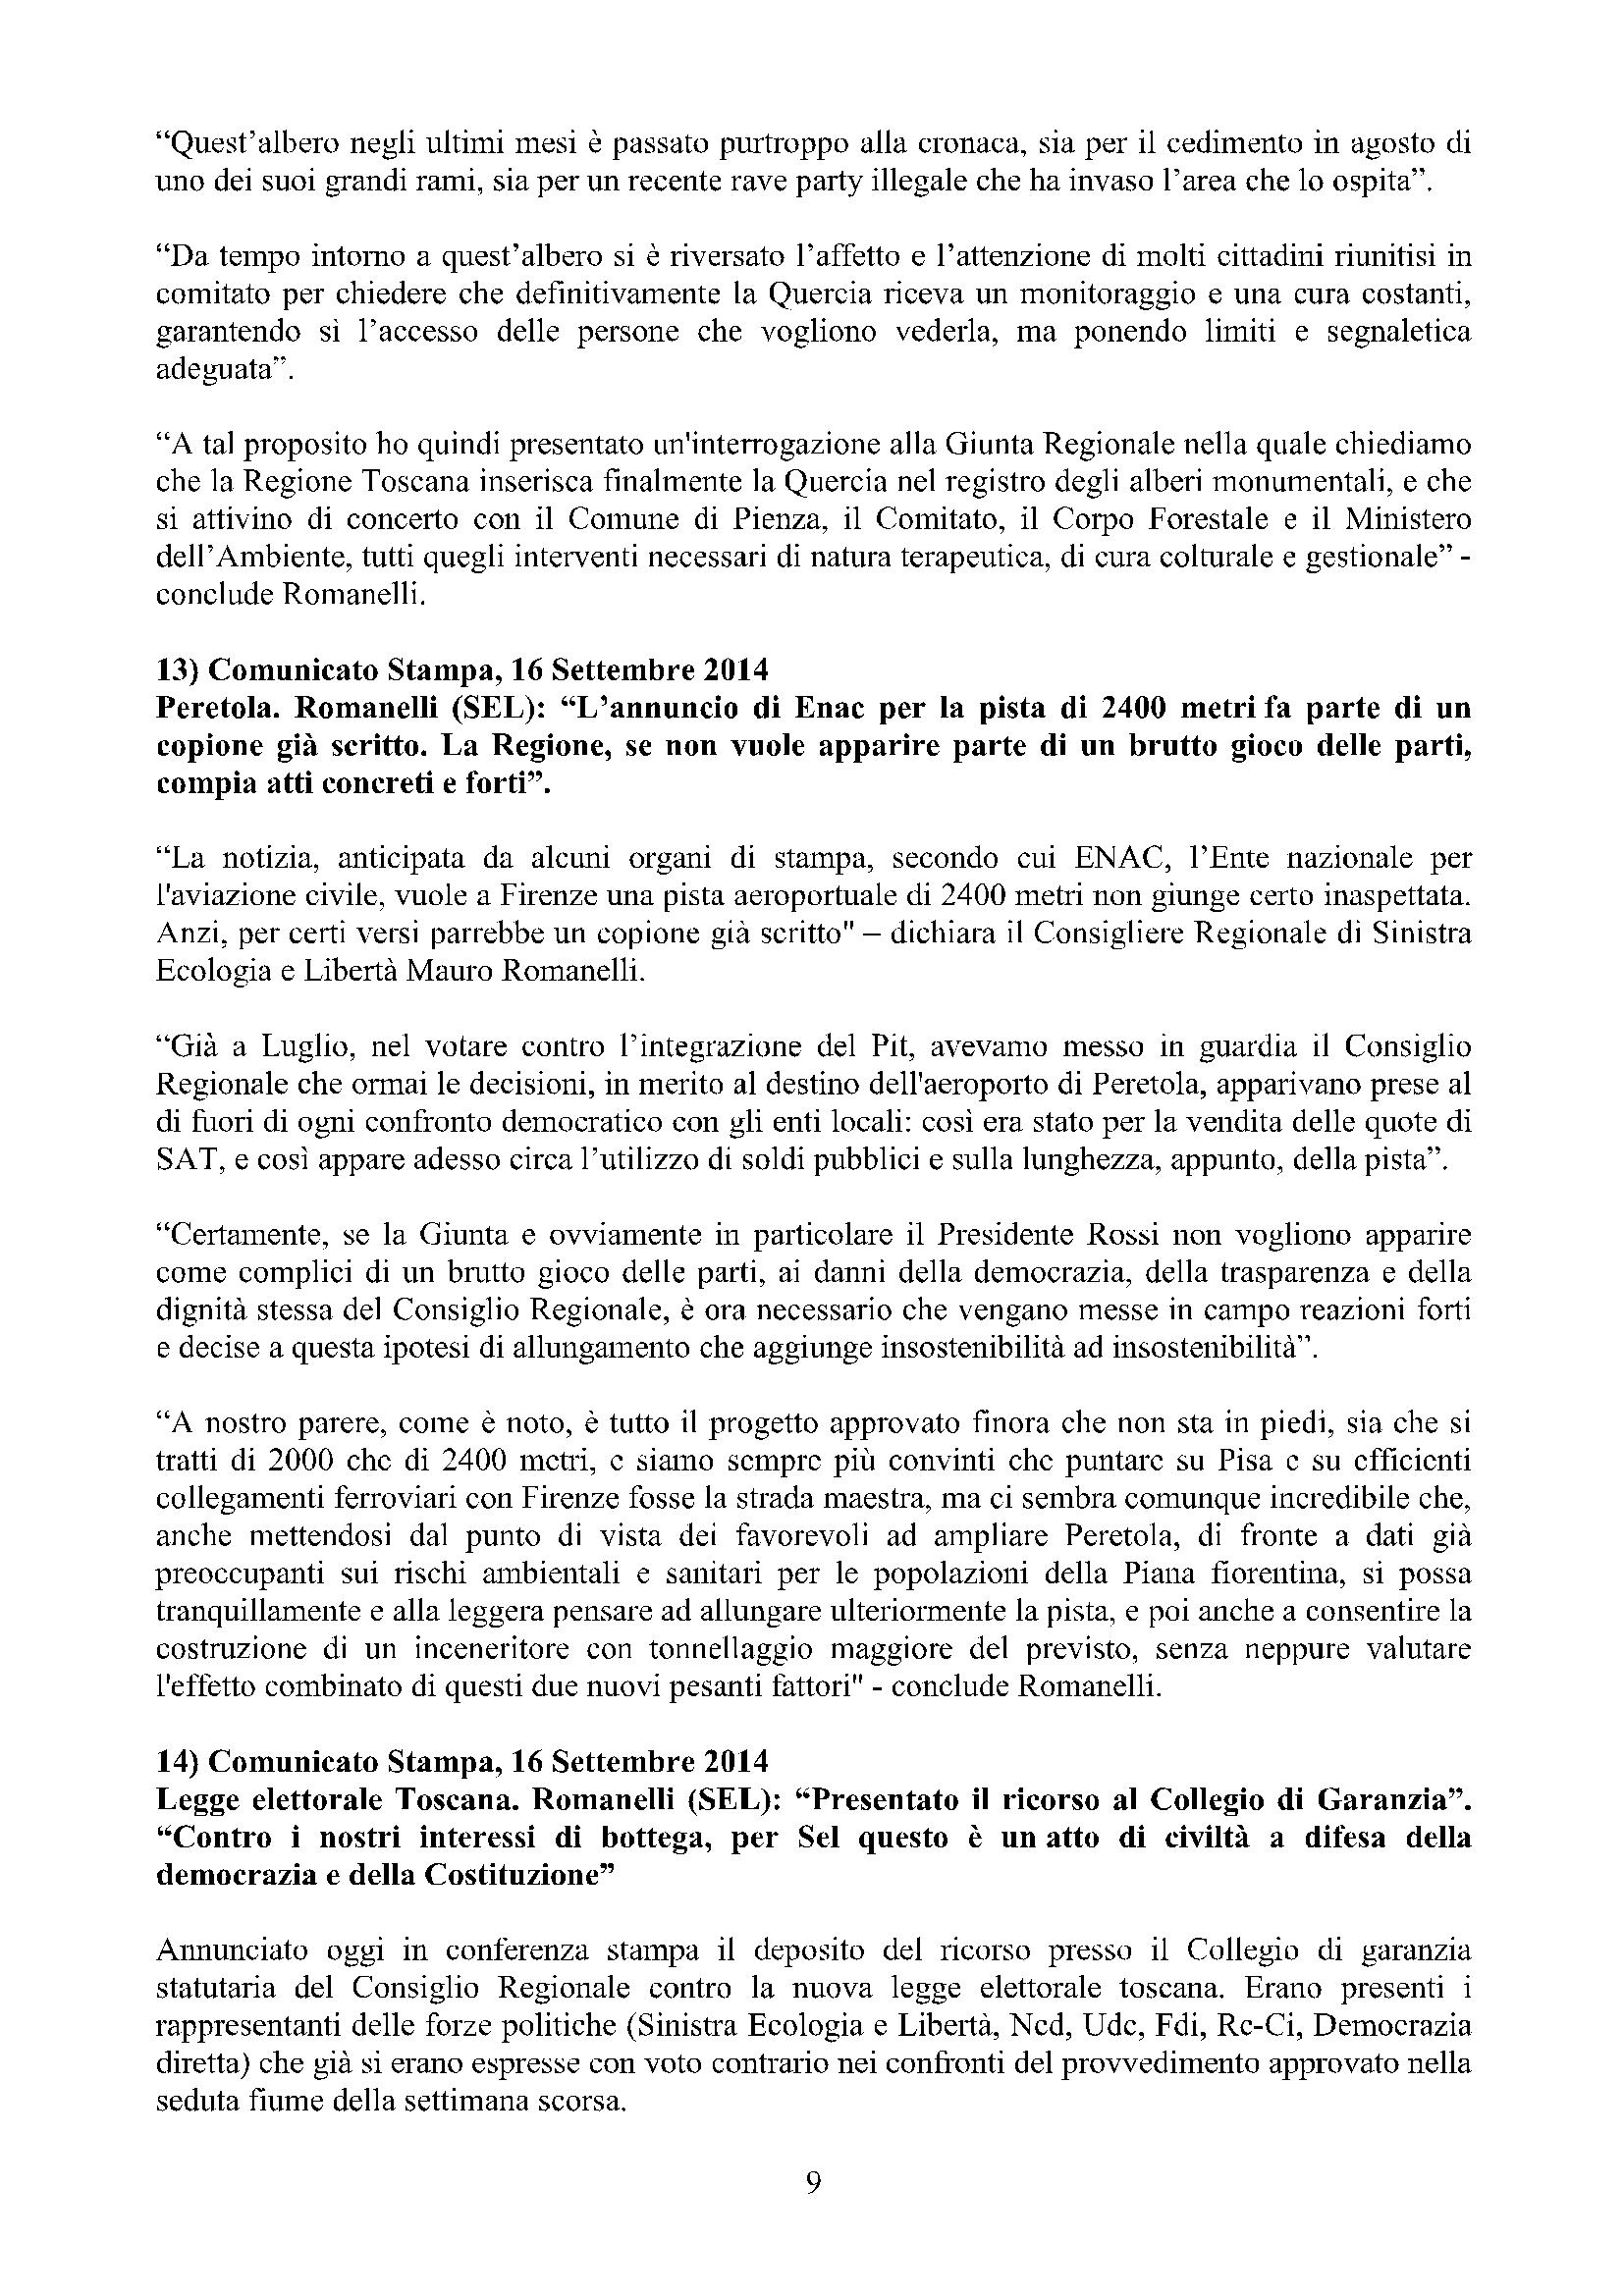 Newsletter di MAURO ROMANELLI Ottobre 2014 – 9